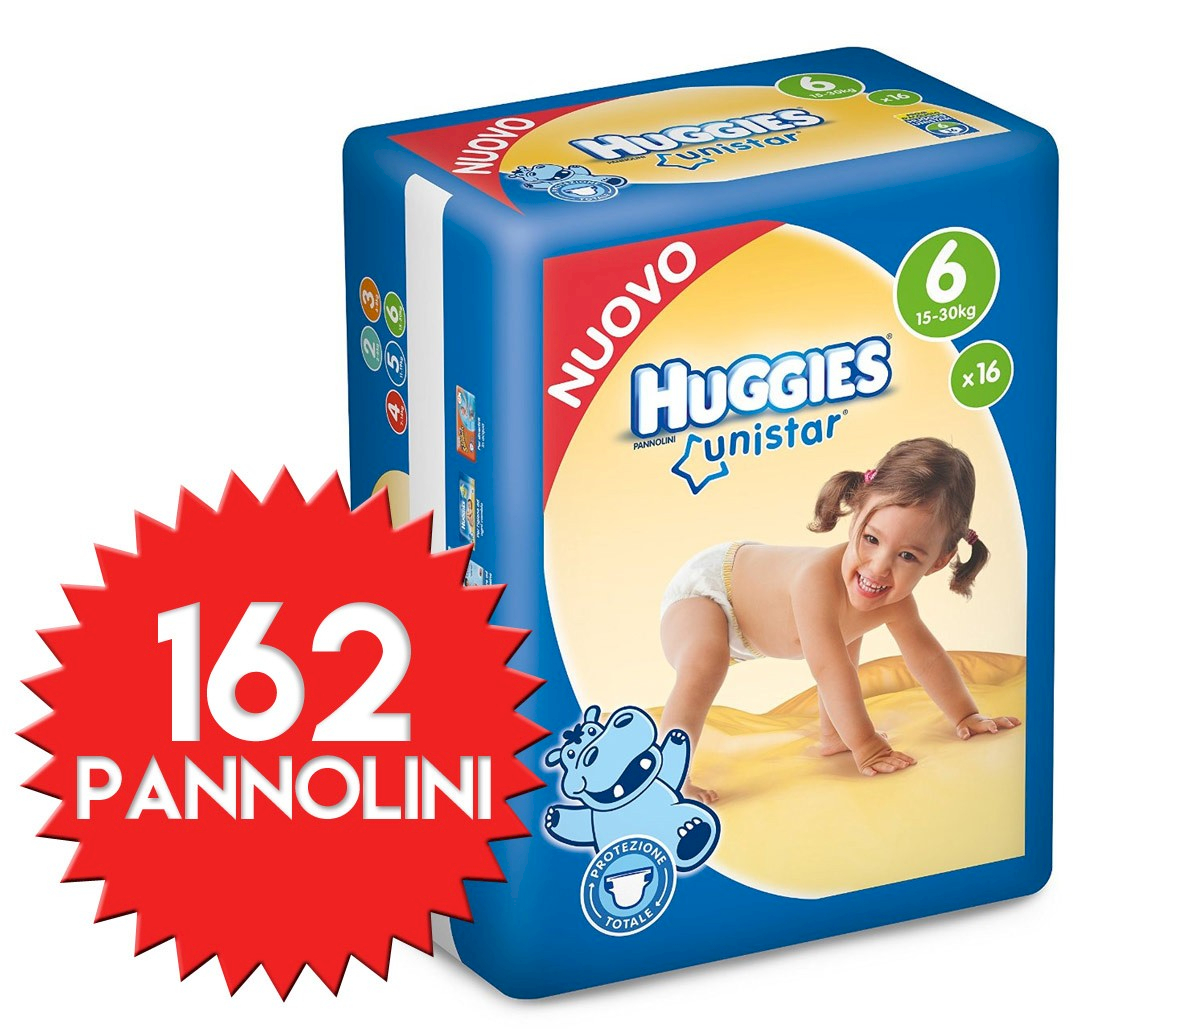 Pannolini Huggies Unistar Misura 6 - 162 pezzi